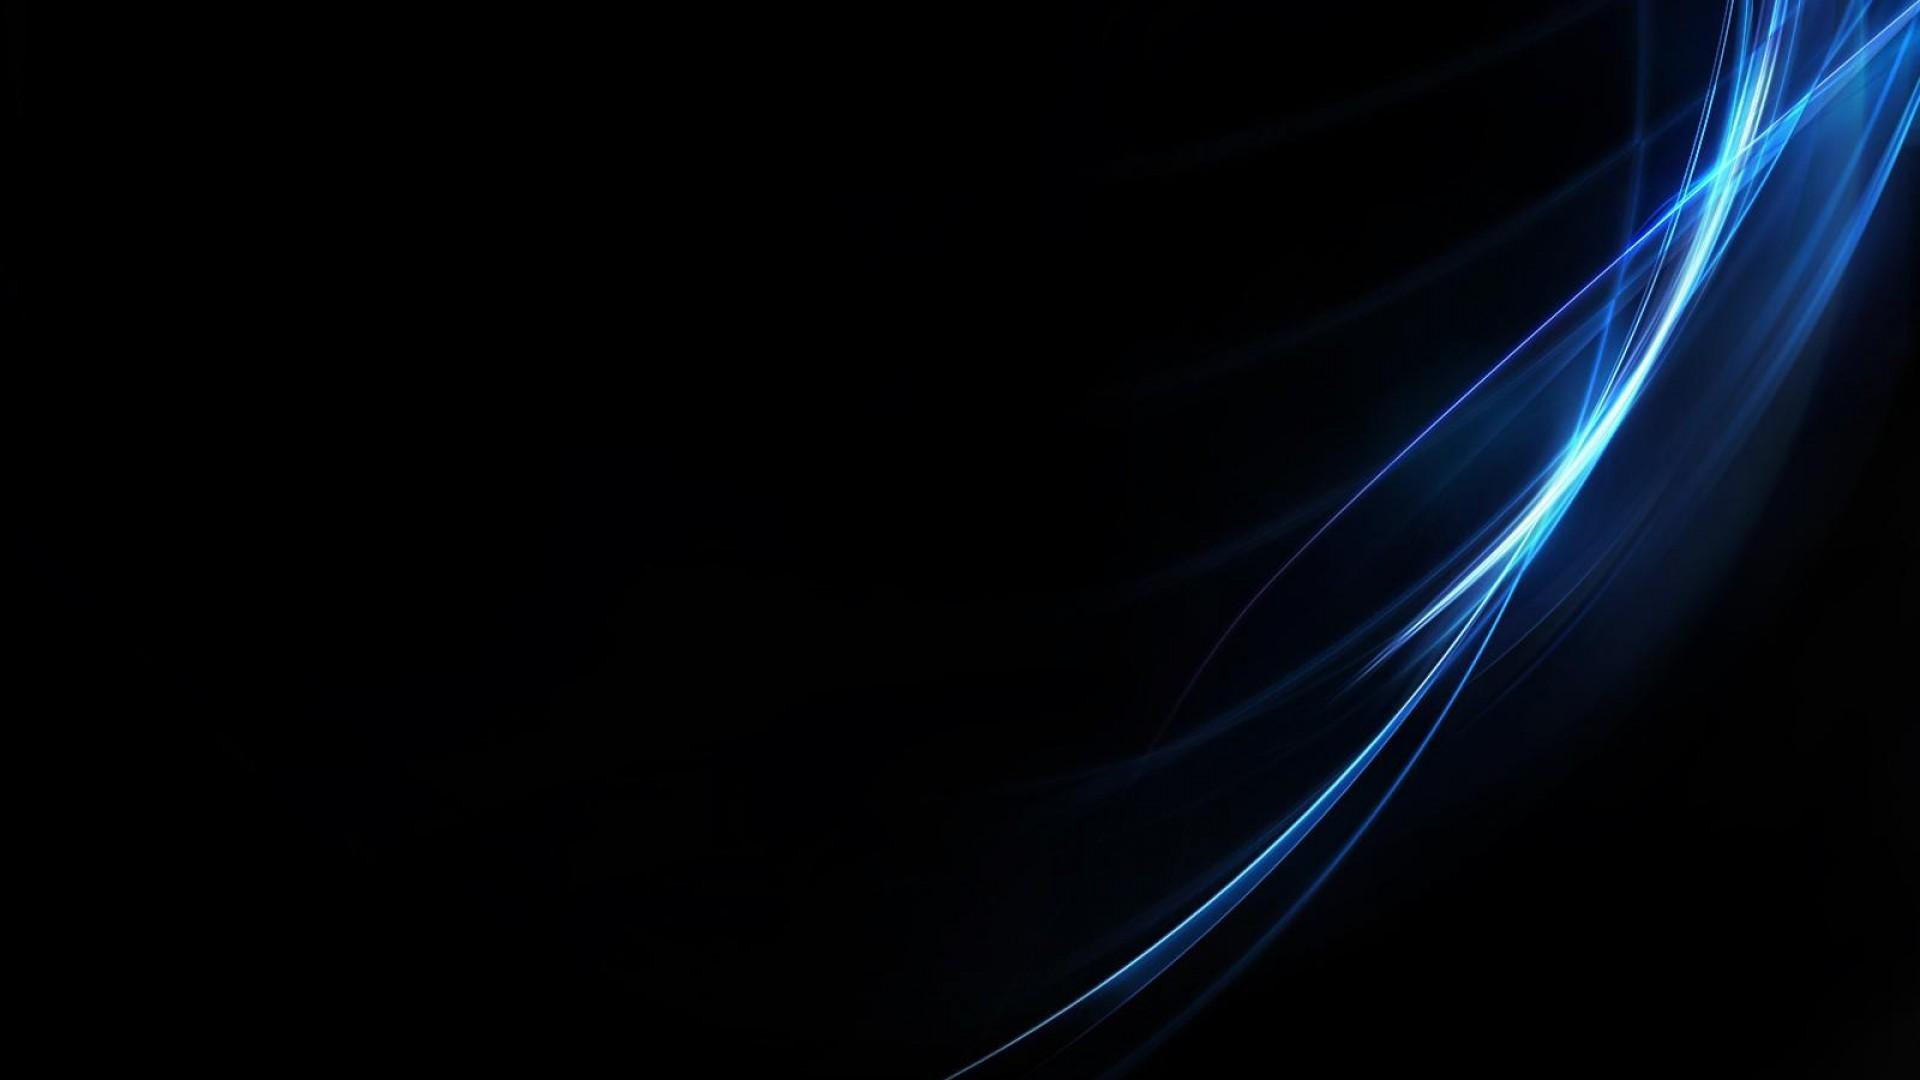 Black and Blue Desktop Wallpaper